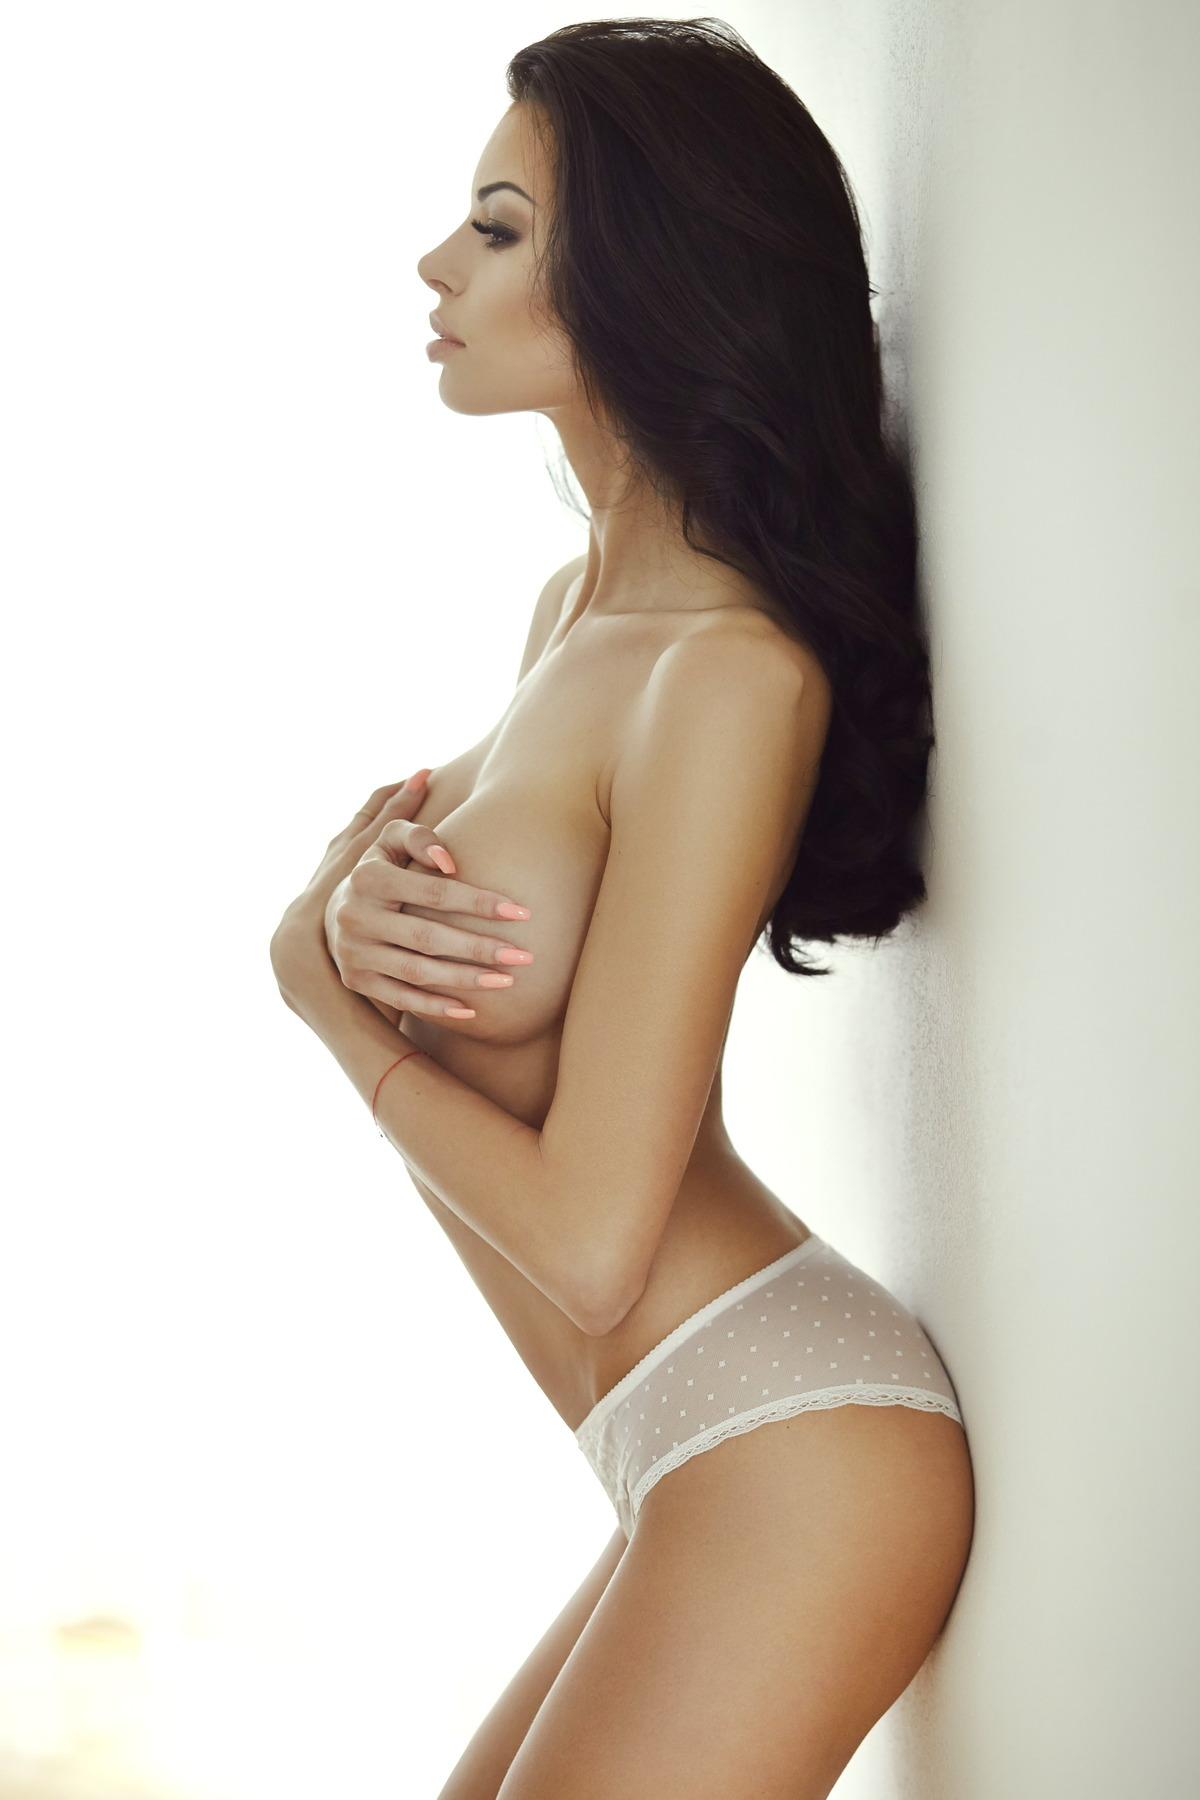 Sexy Girl zeigt Traumkörper